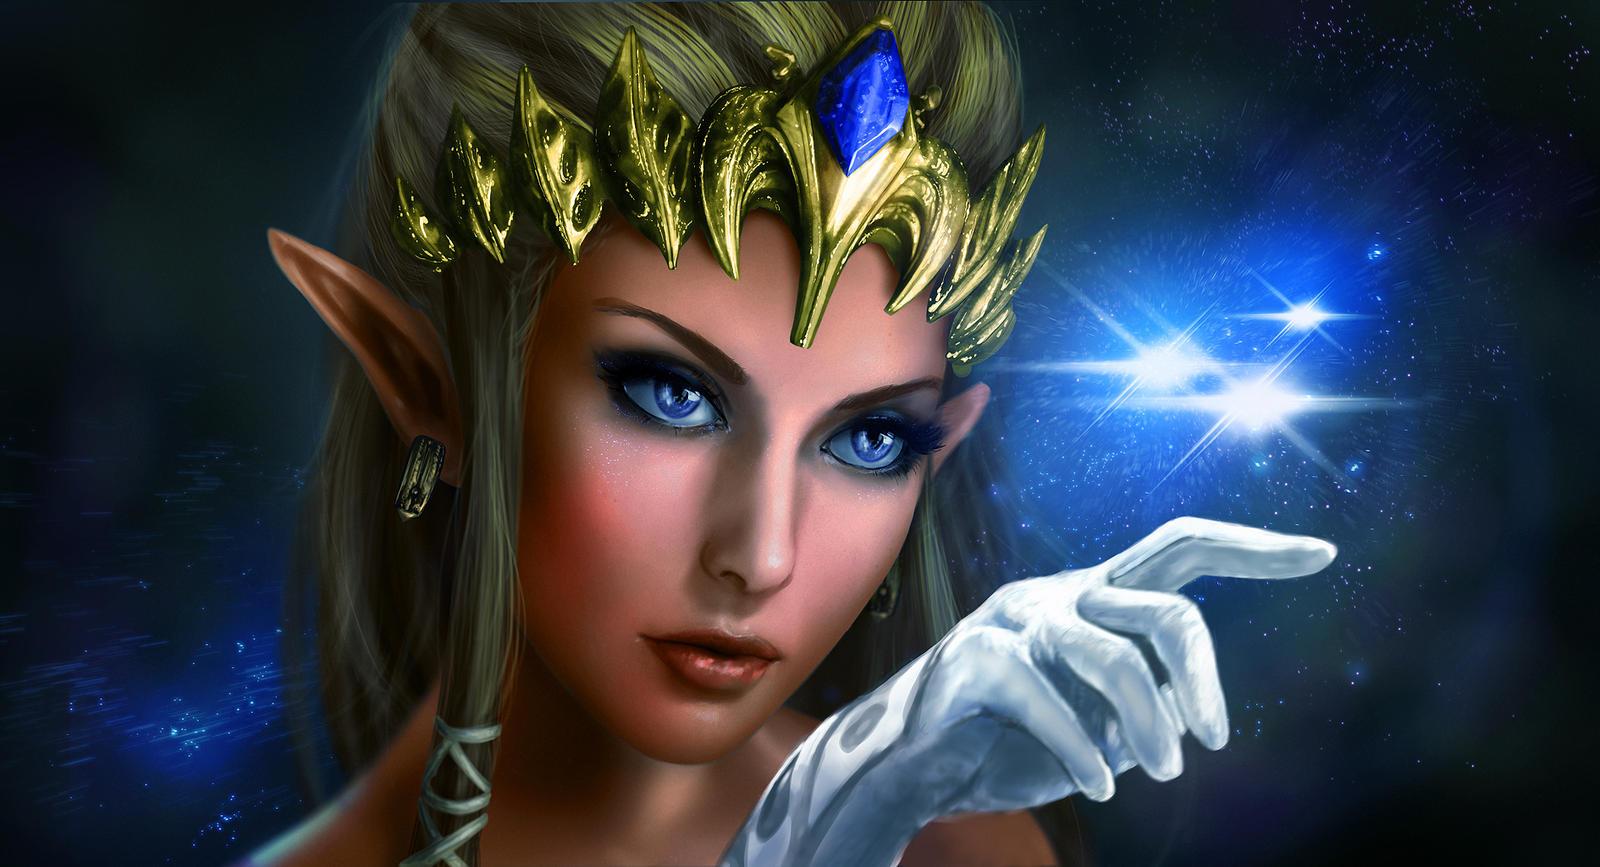 Zelda by skribbliX